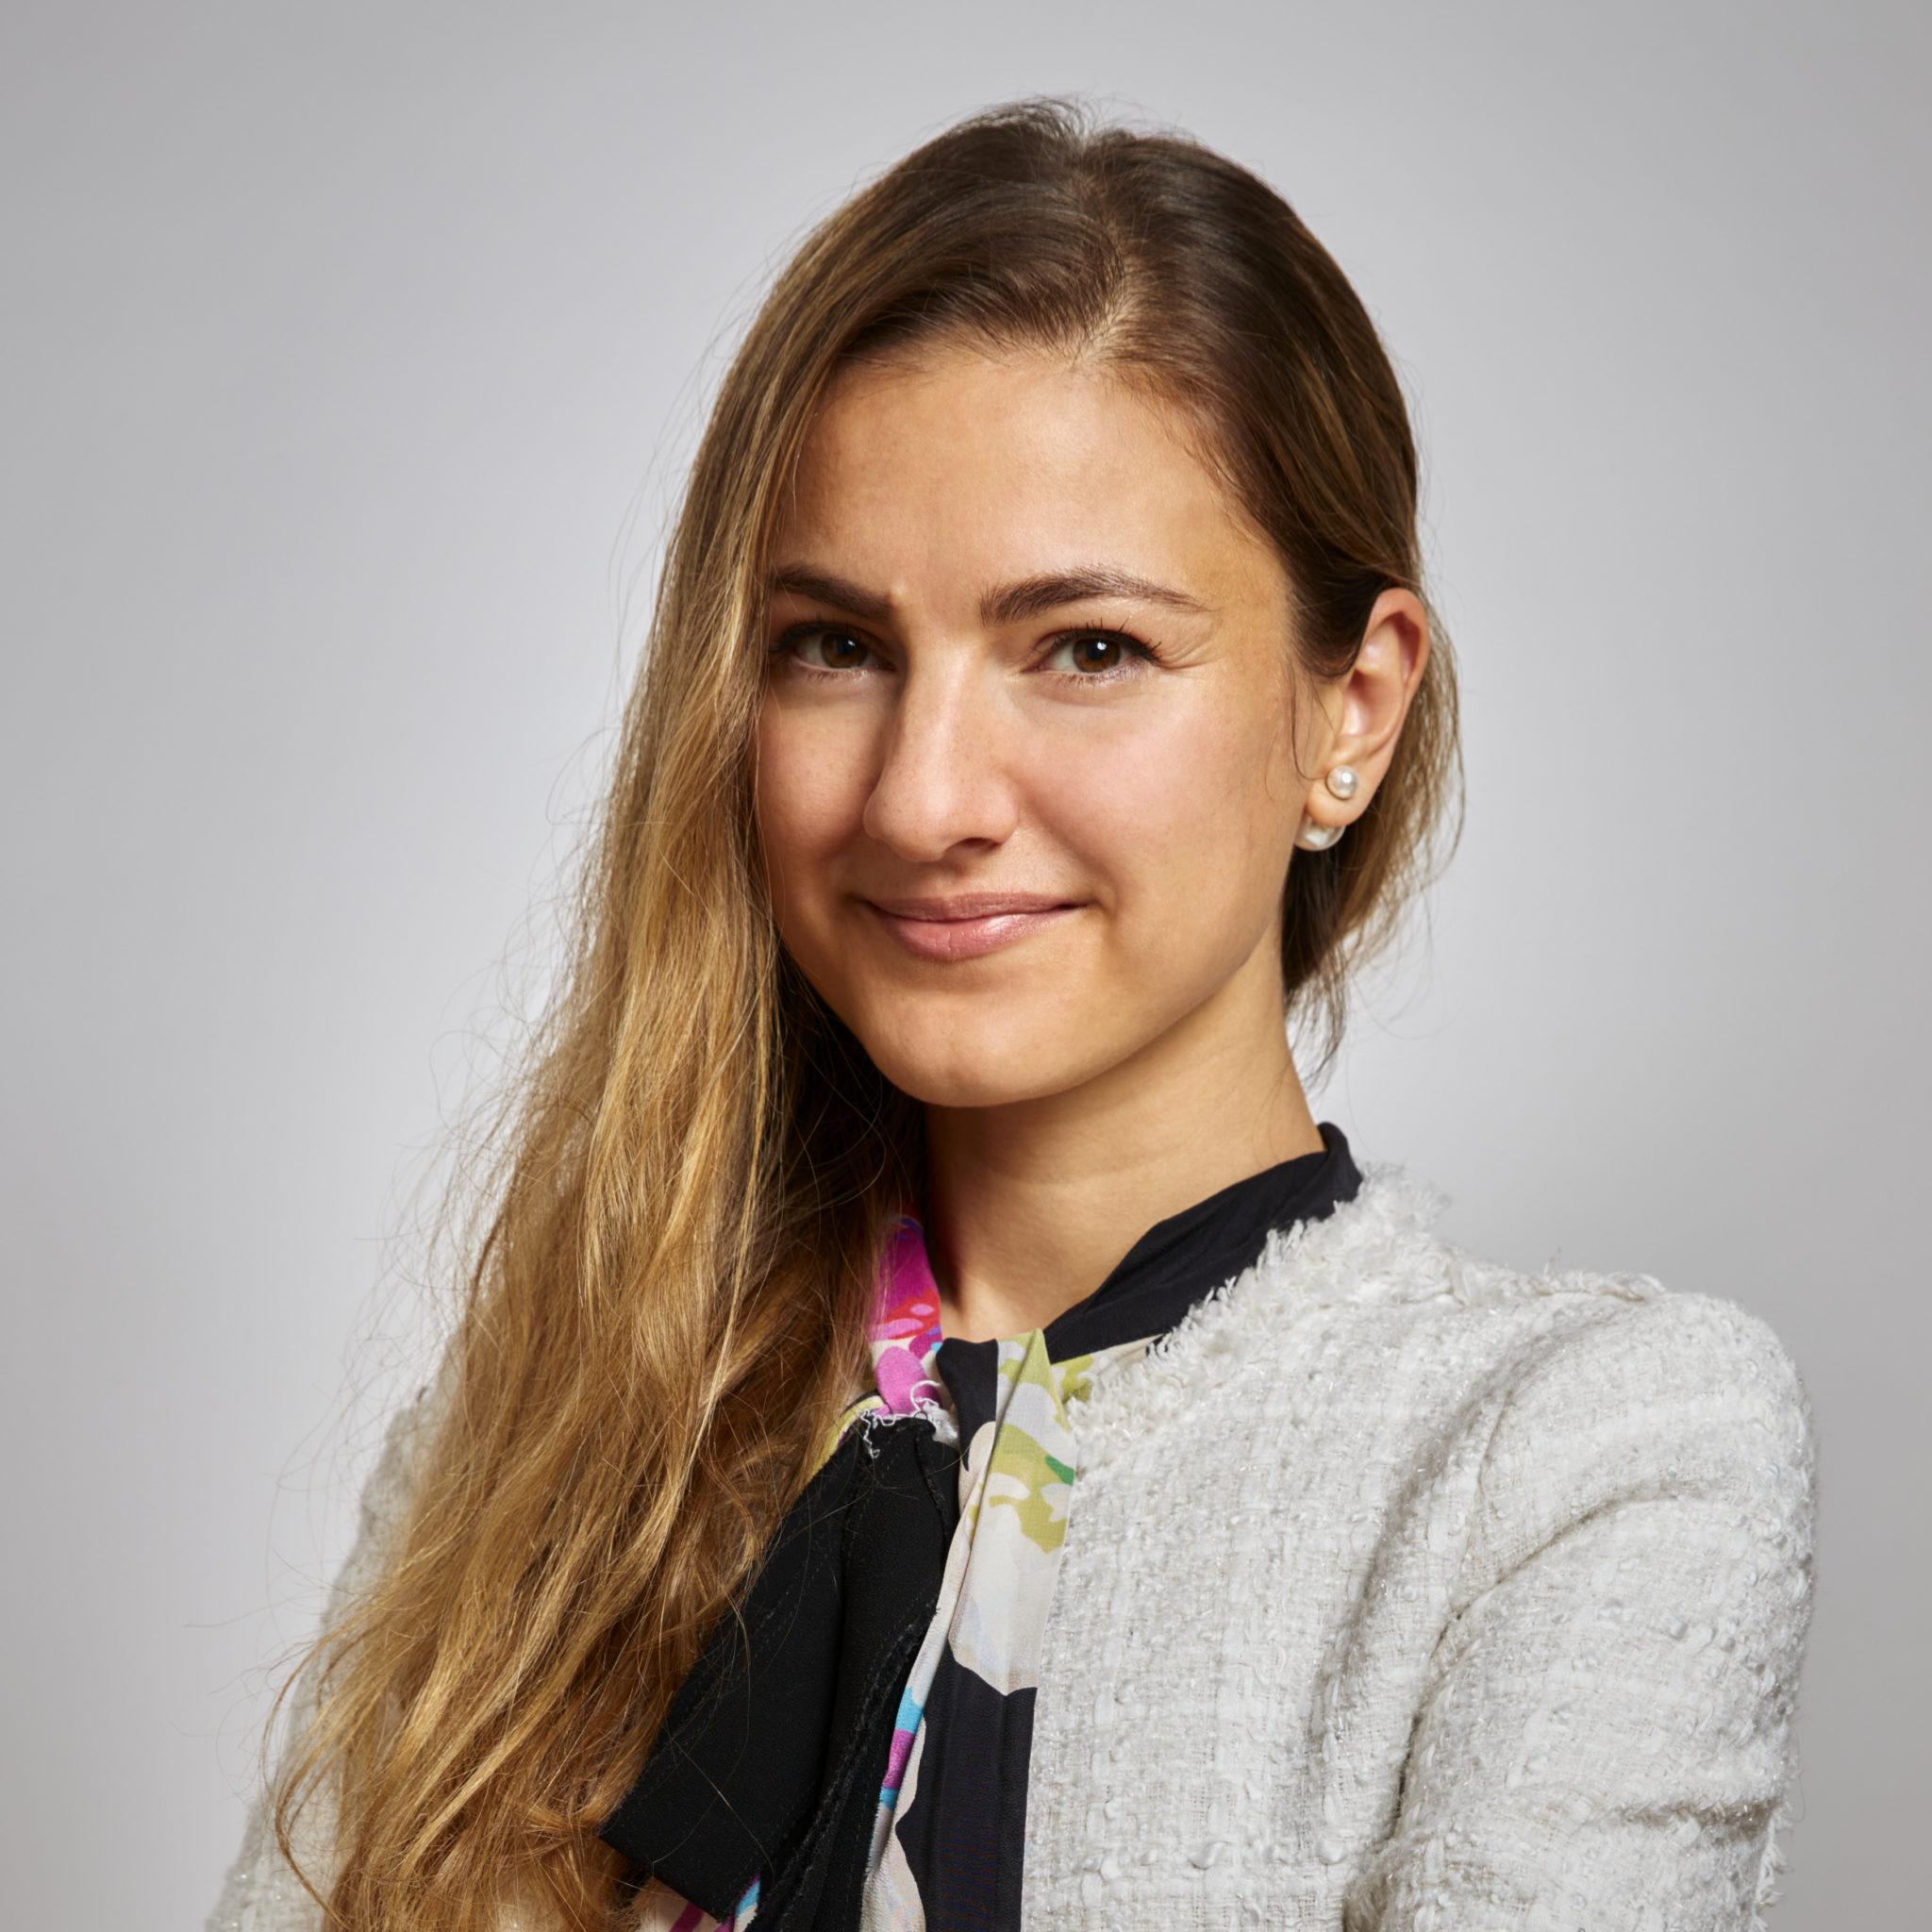 LPEA Natalia Koltunovskaya 2 1x1 1 scaled